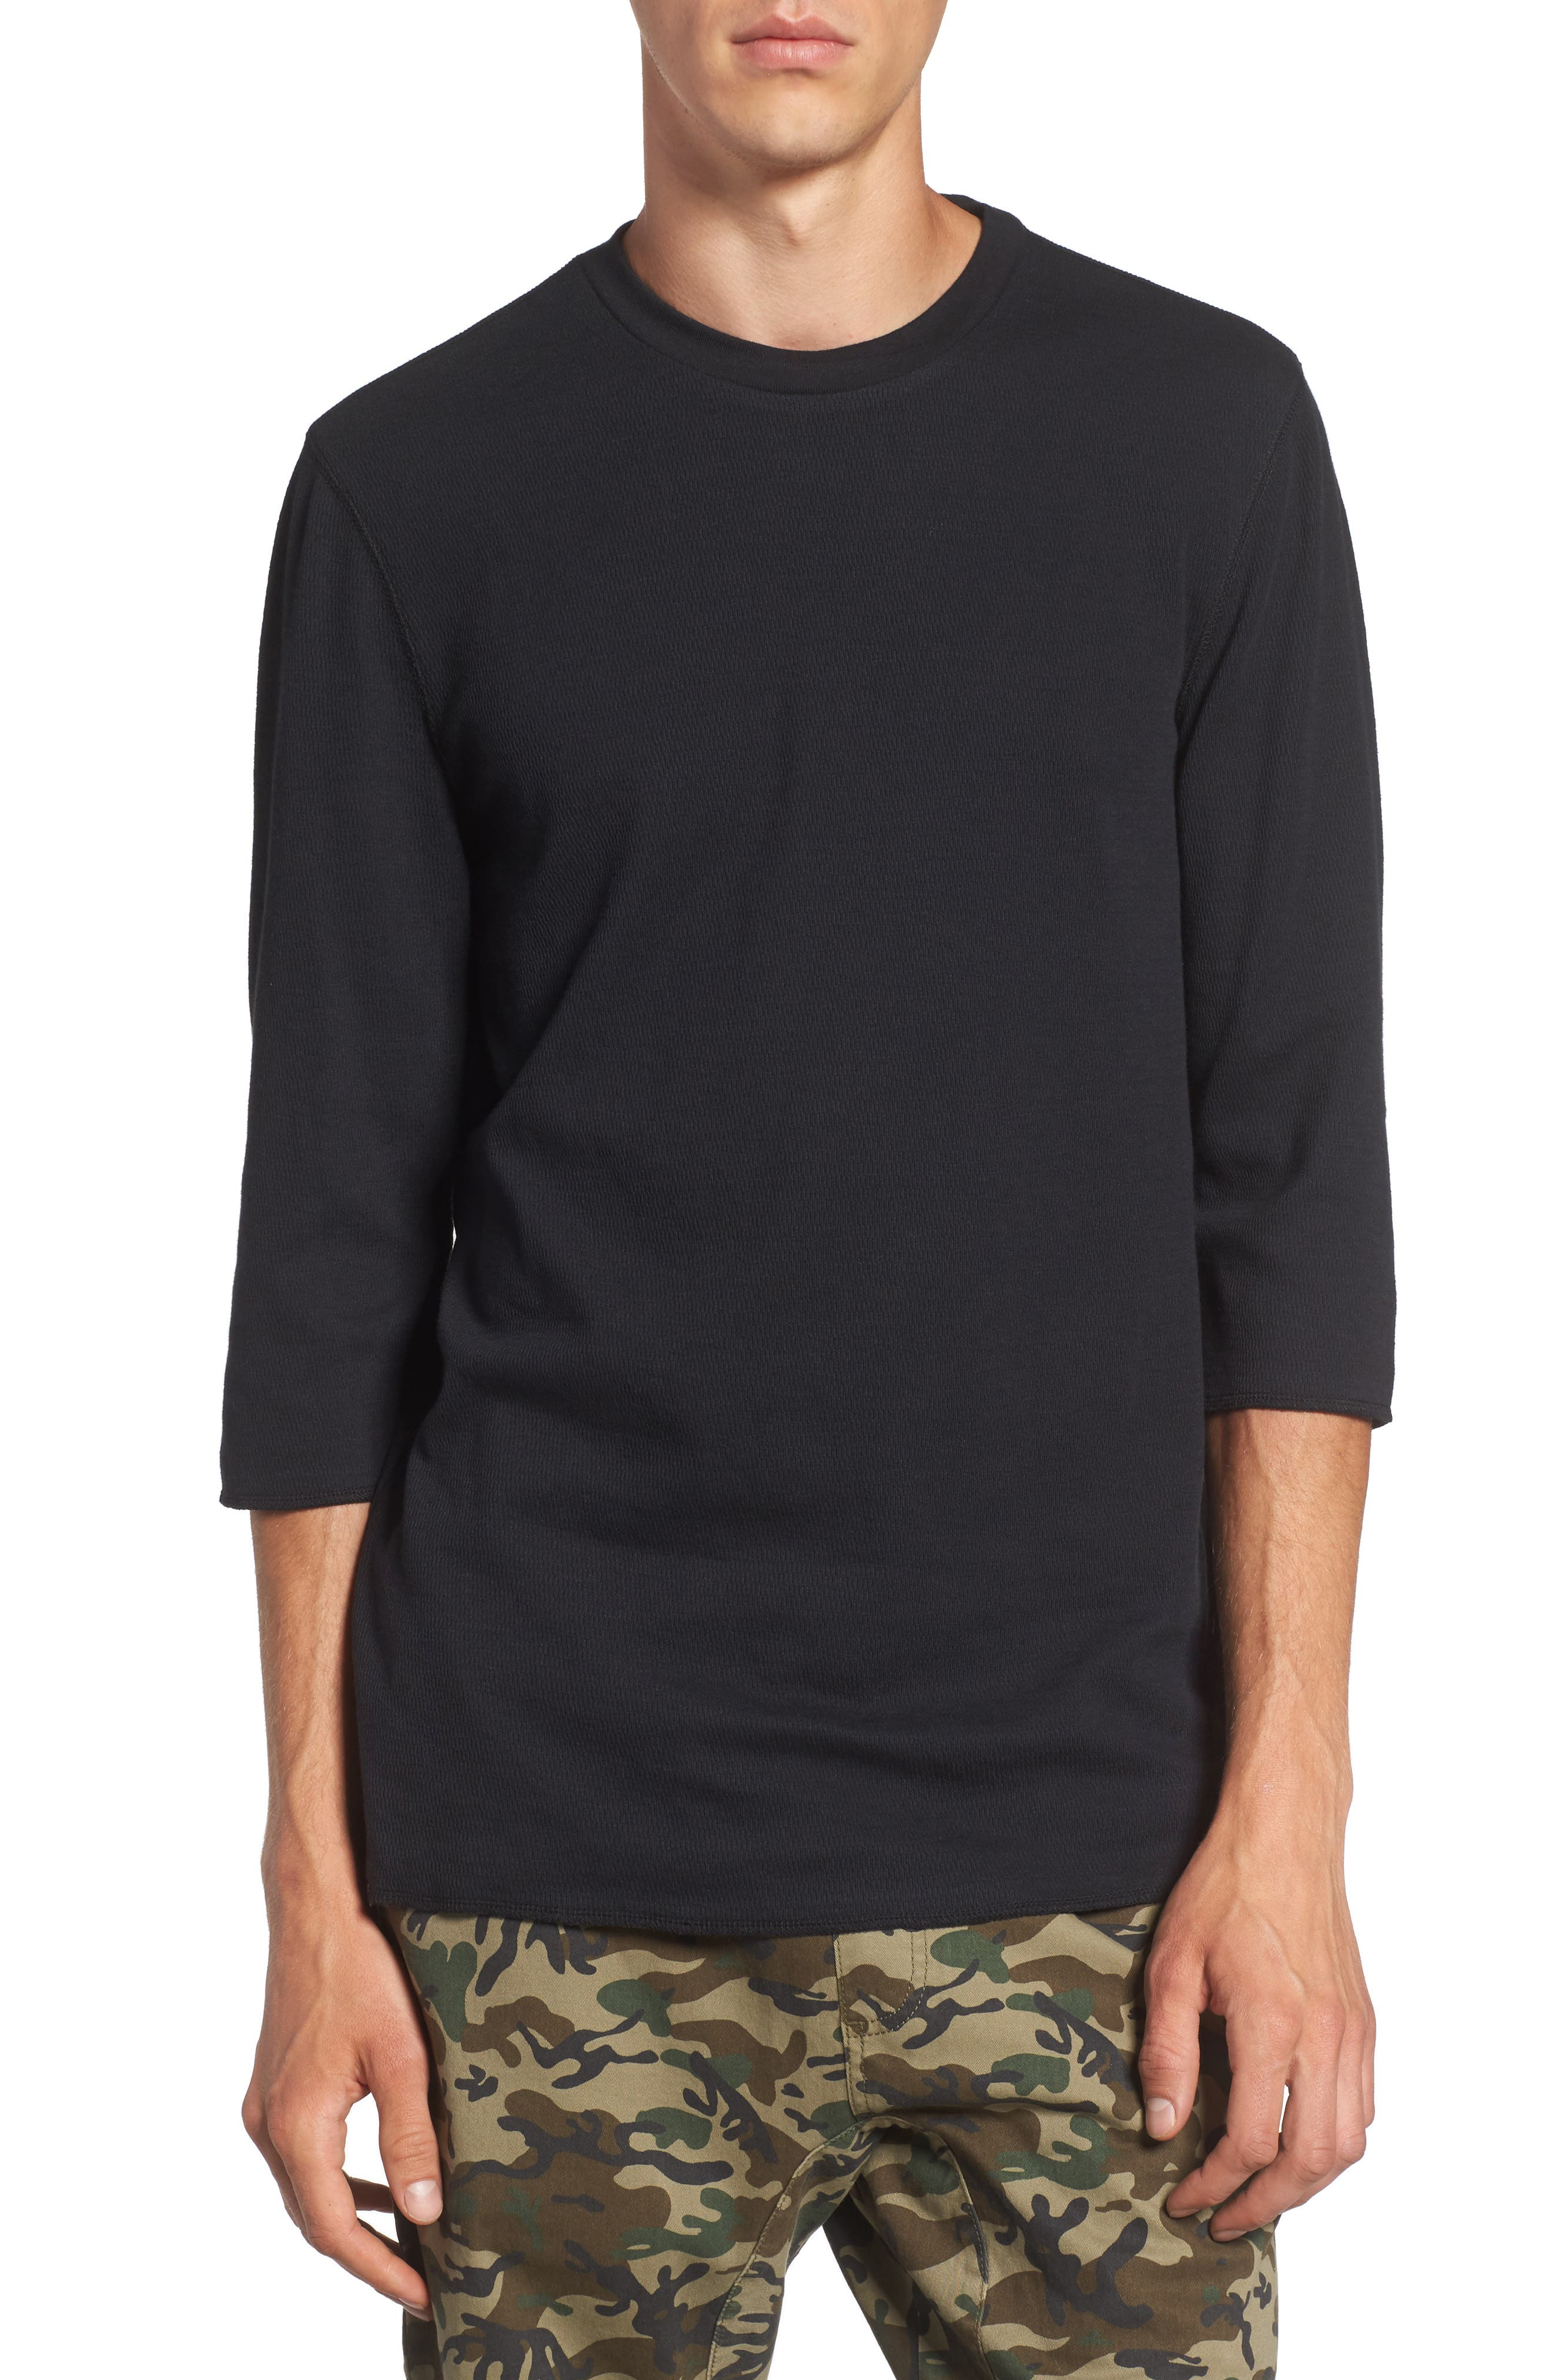 The Rail Three-Quarter-Sleeve Thermal T-Shirt